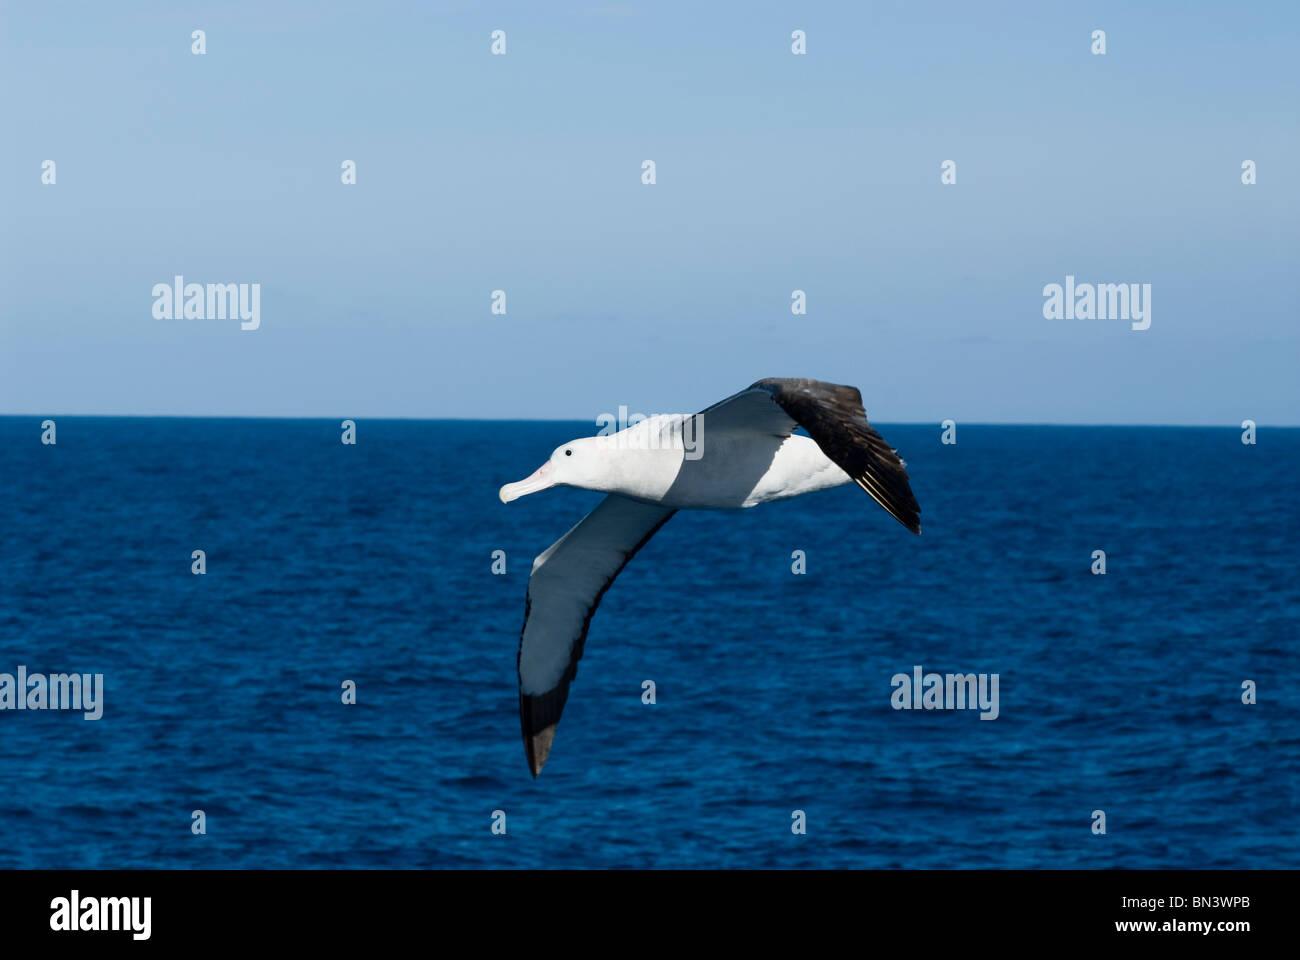 A Wondering Albatross, Diomedea exulans, flying, Antarctica - Stock Image